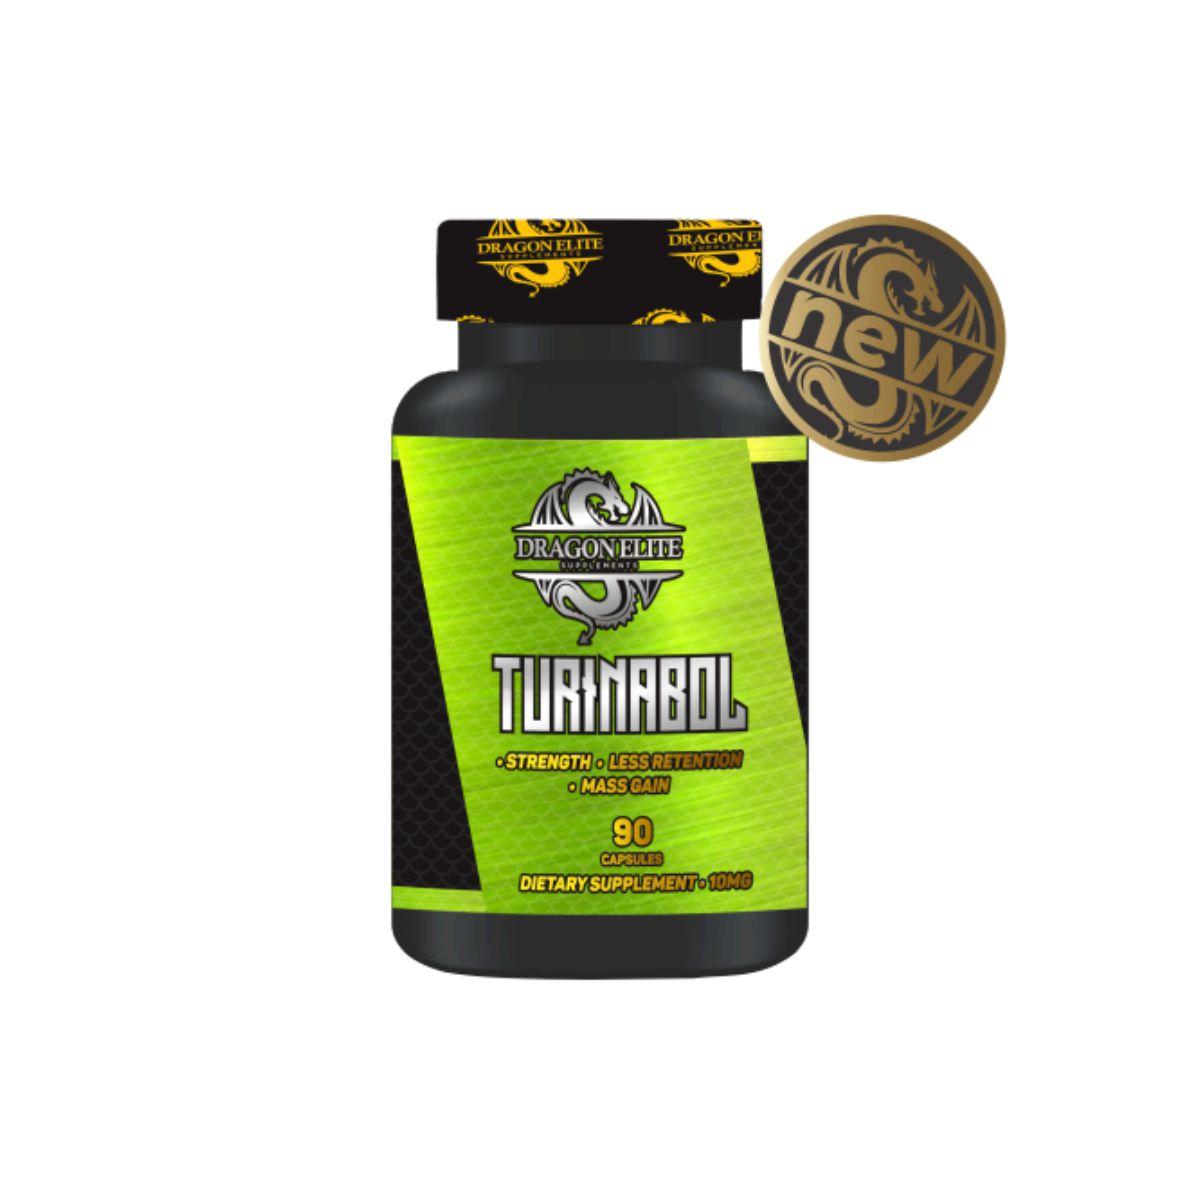 Pró-Hormonal Turinabol 90 Caps - Dragon Elite